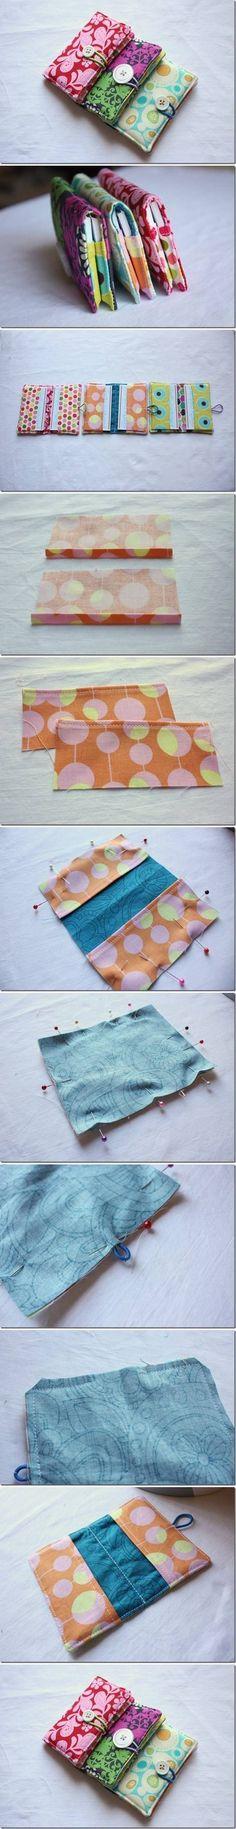 DIY Sew Business Card Holder DIY Sew Business Card Holder